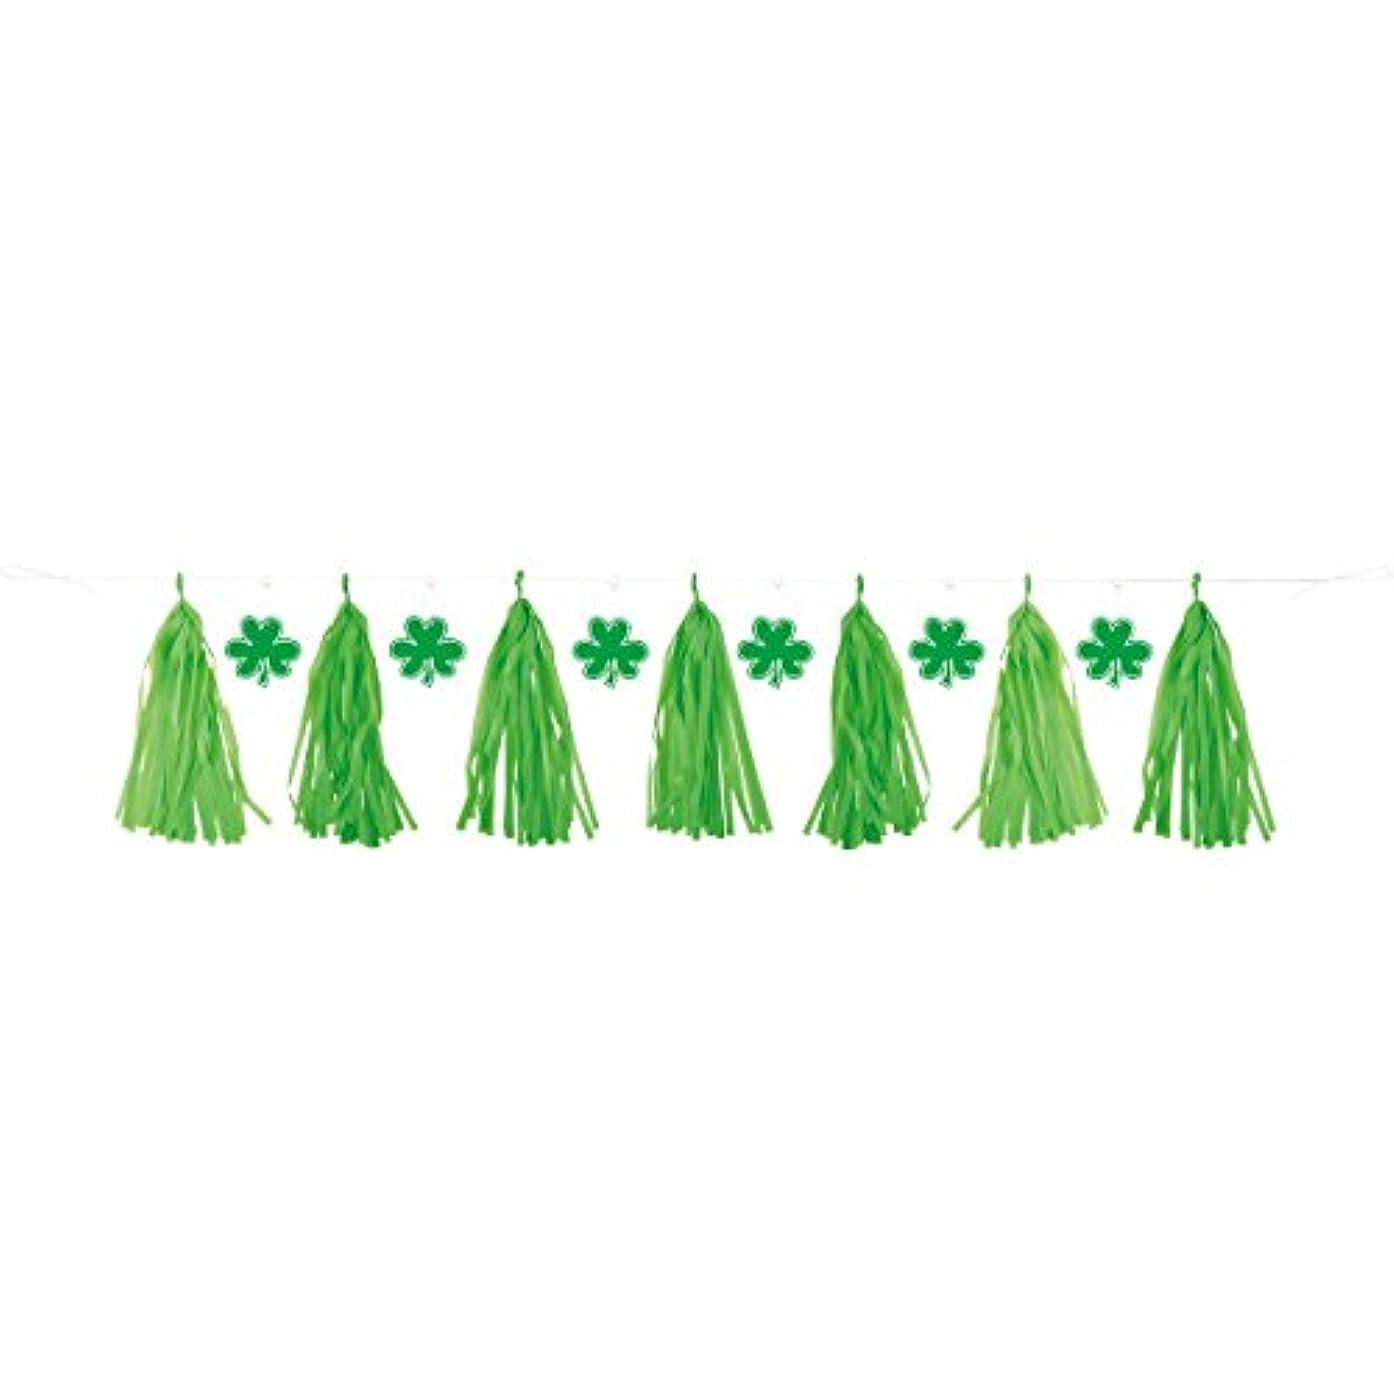 7ft Plastic St. Patrick's Day Tassel Garland